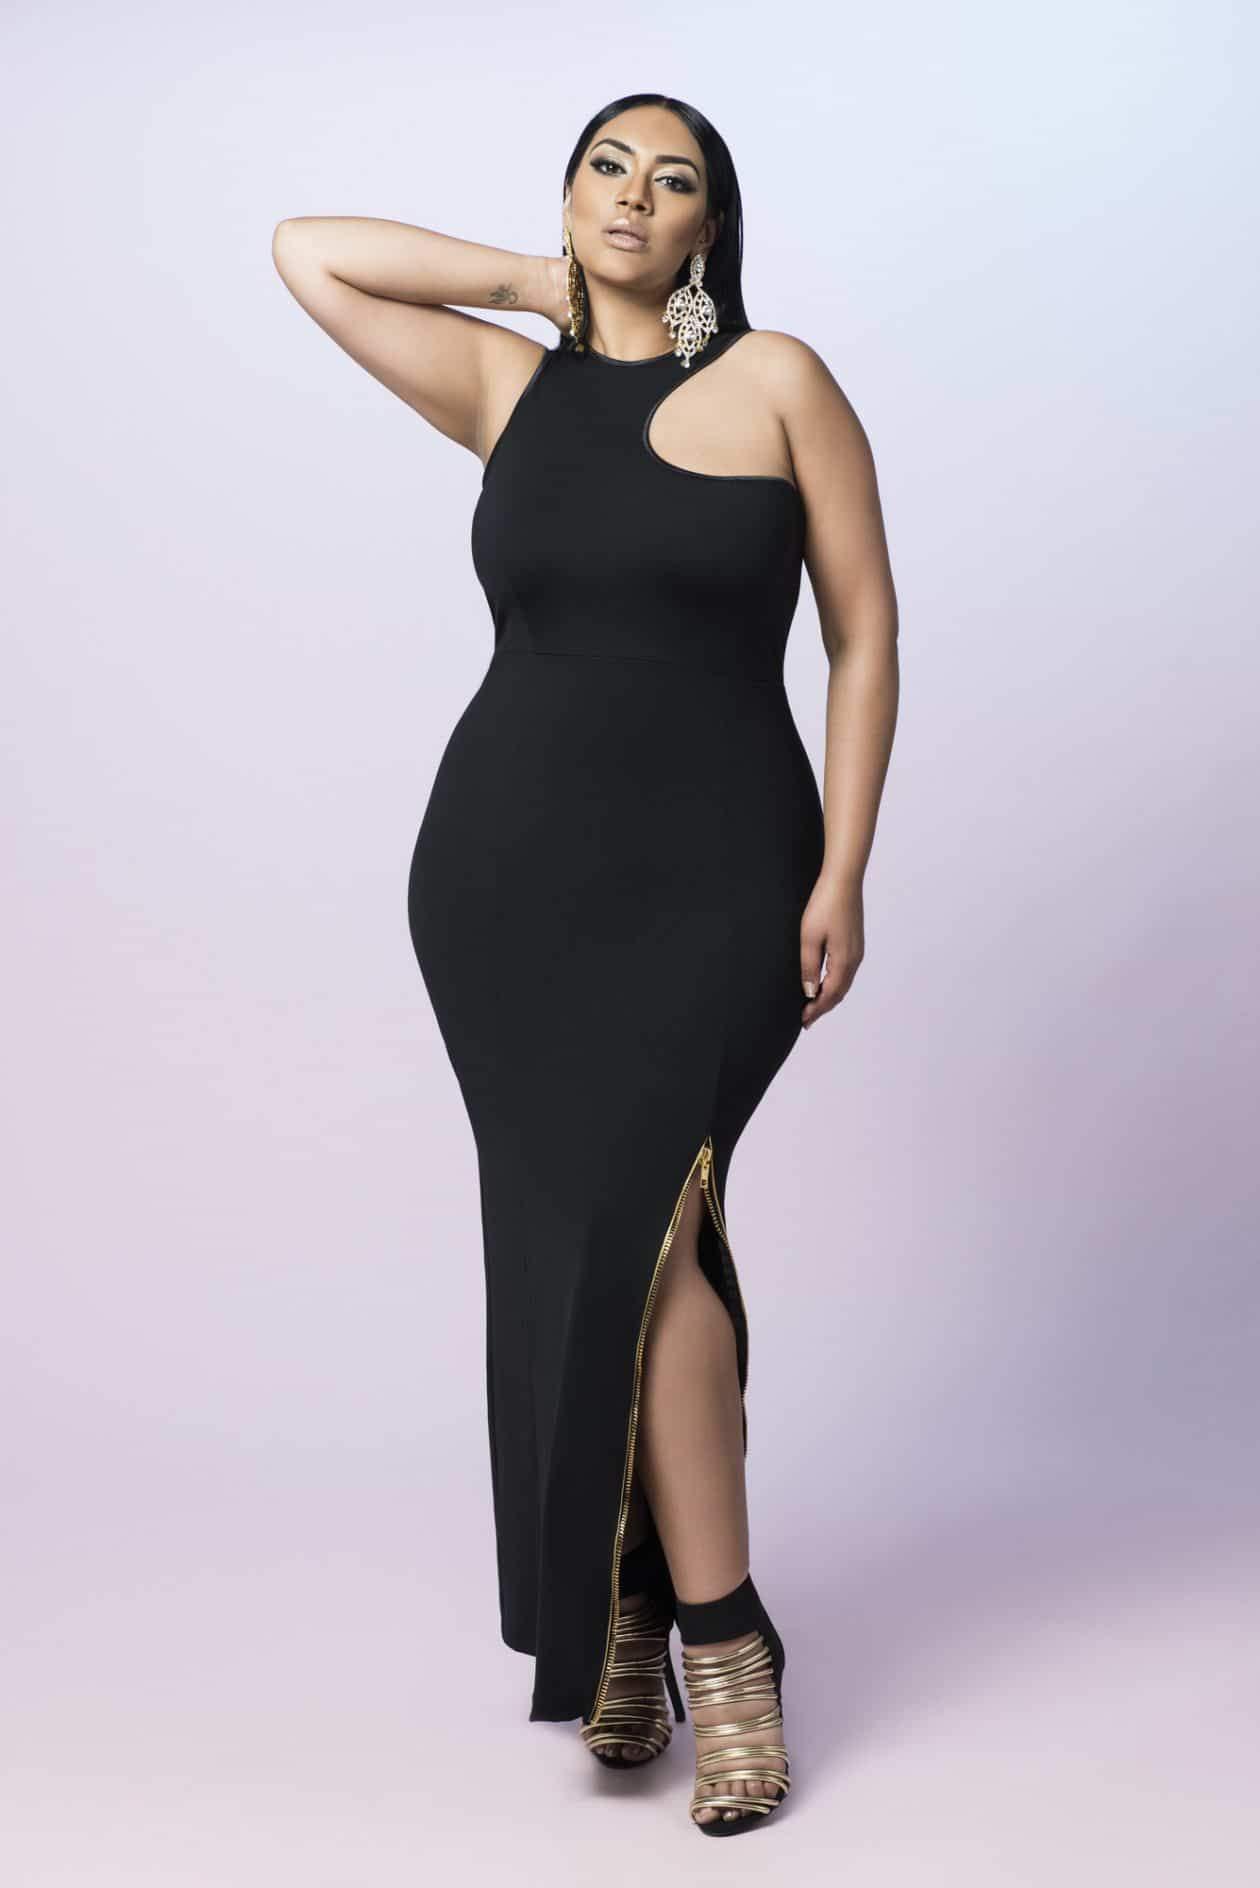 Plus Size Fashionista Newhairstylesformen2014 Com